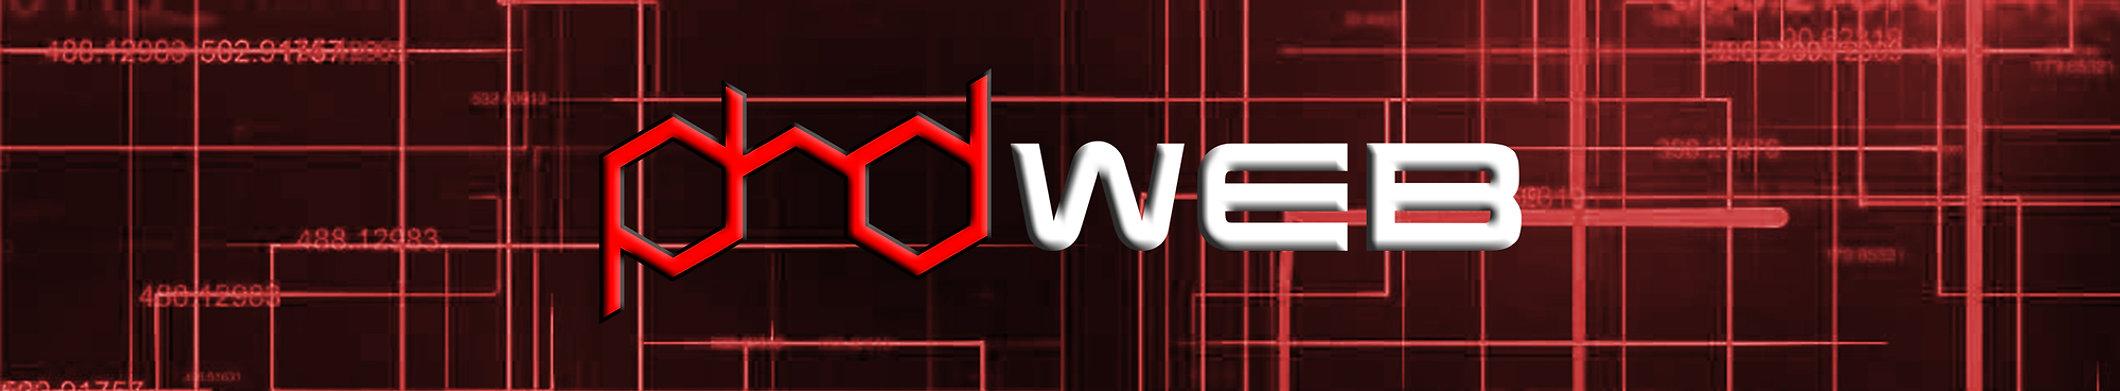 PHD WEB.jpg